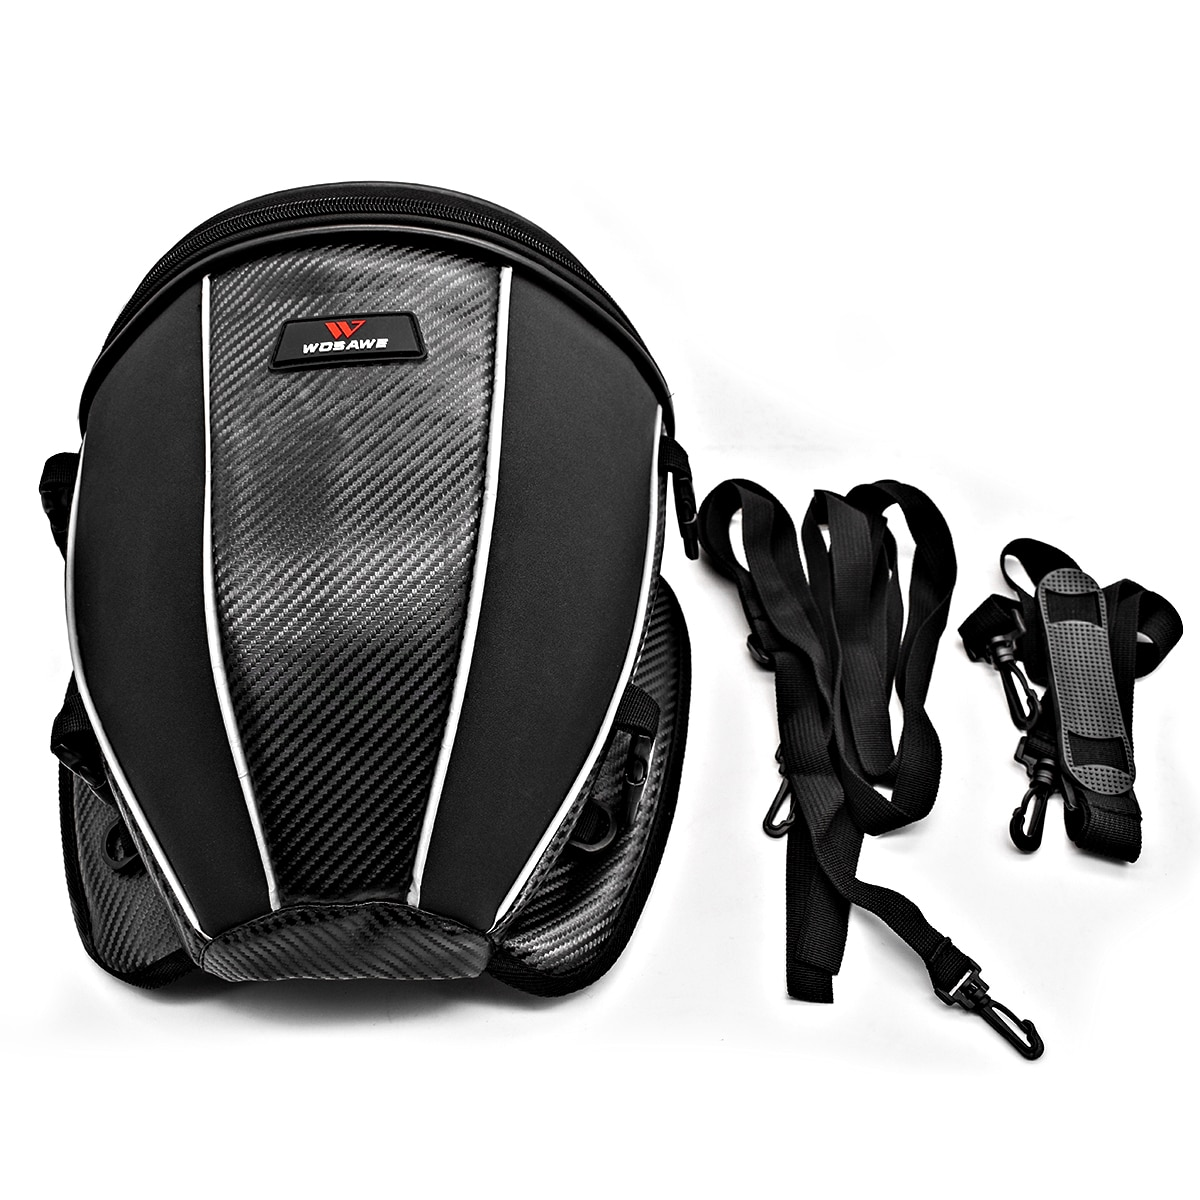 Motorcycle Tail Bags Motorbike Back Seat Storage Bag Saddlebag Multifunctional Waterproof Motocross Racing Travel Bag accessory